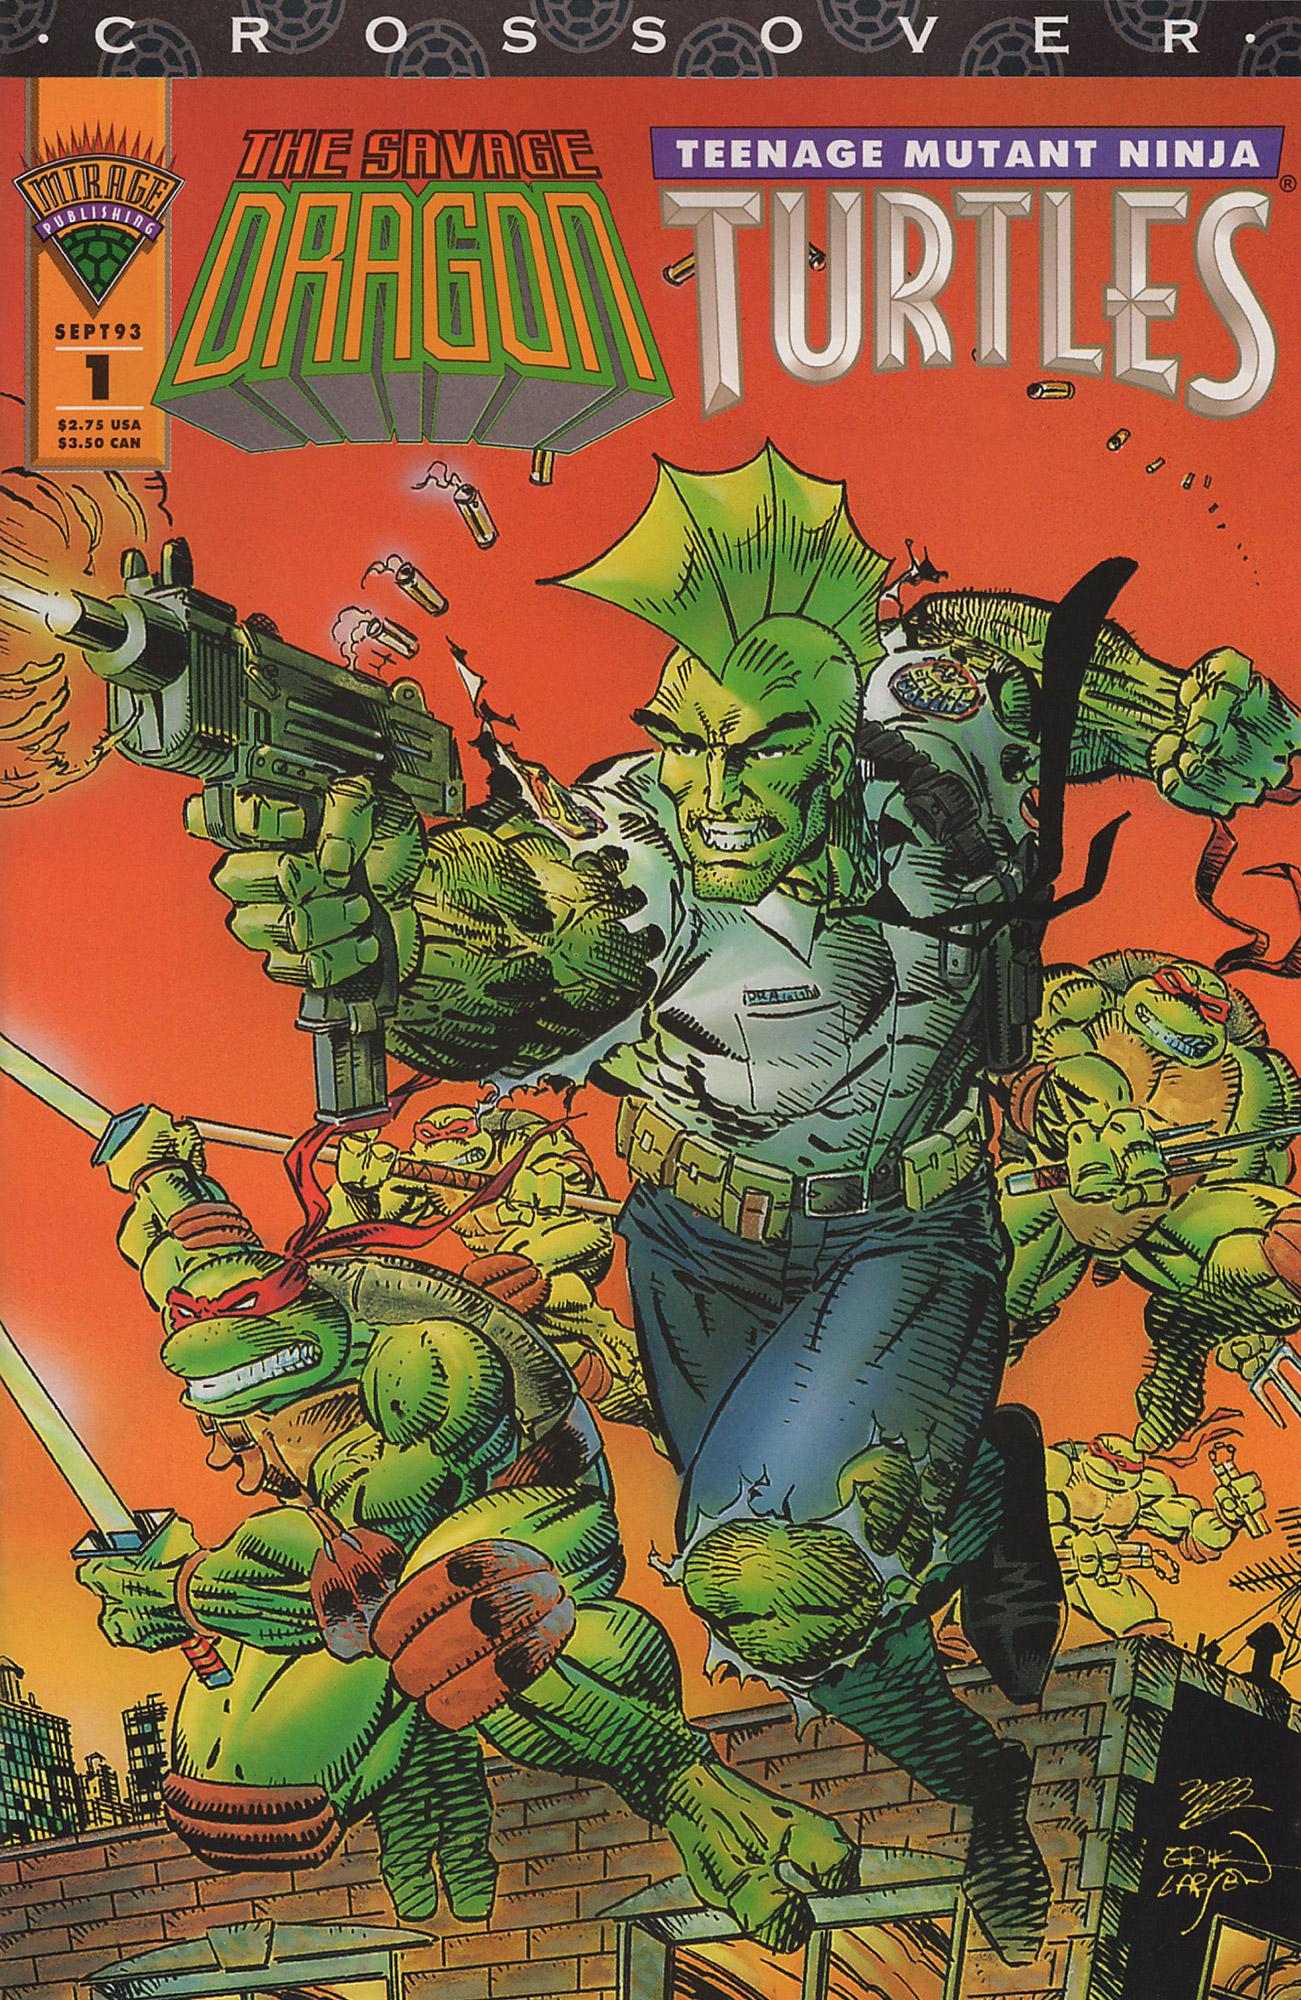 Cover Savage Dragon TMNT #01